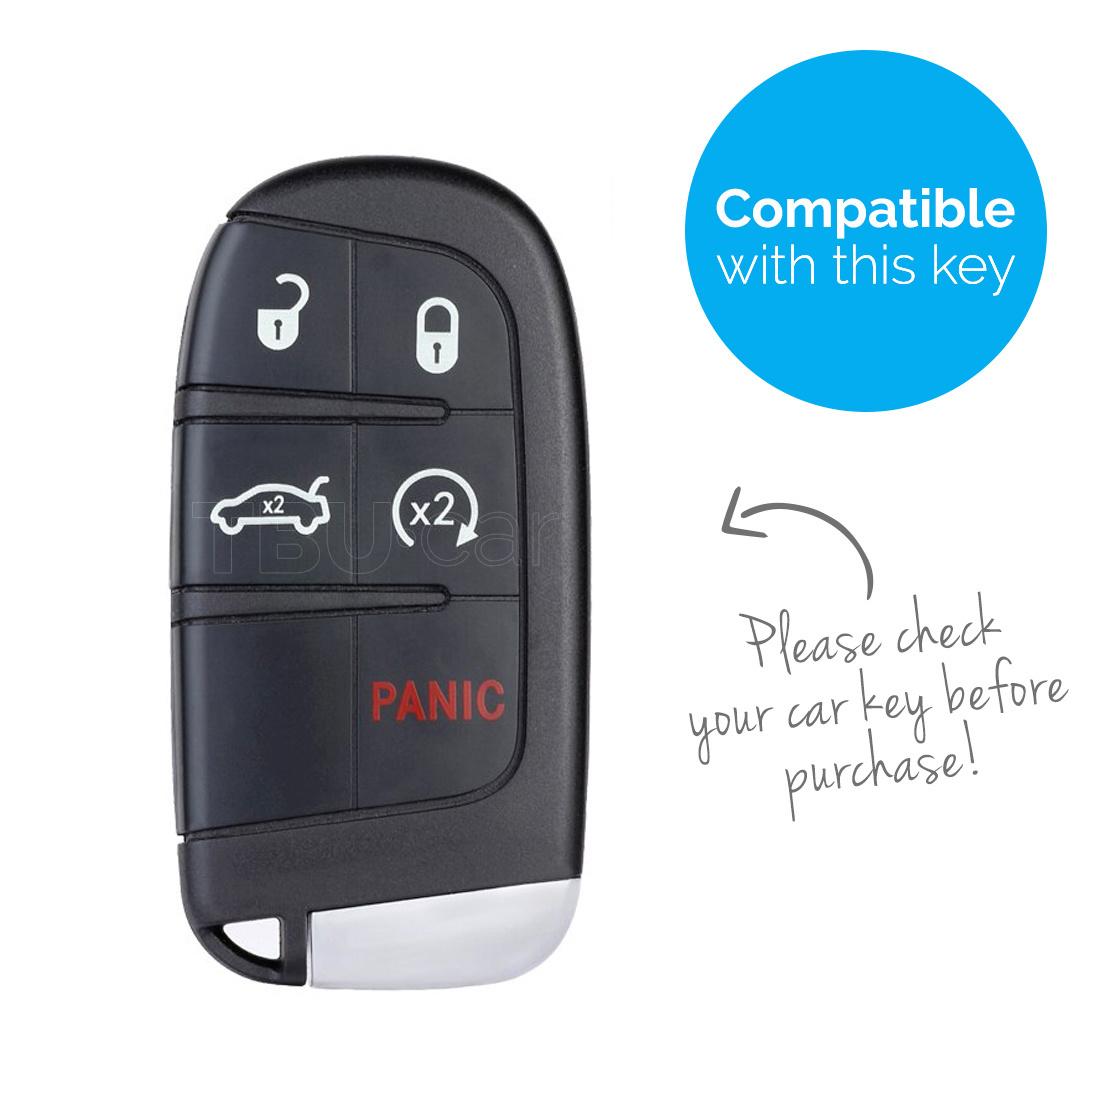 TBU car TBU car Sleutel cover compatibel met Jeep - Silicone sleutelhoesje - beschermhoesje autosleutel - Roze